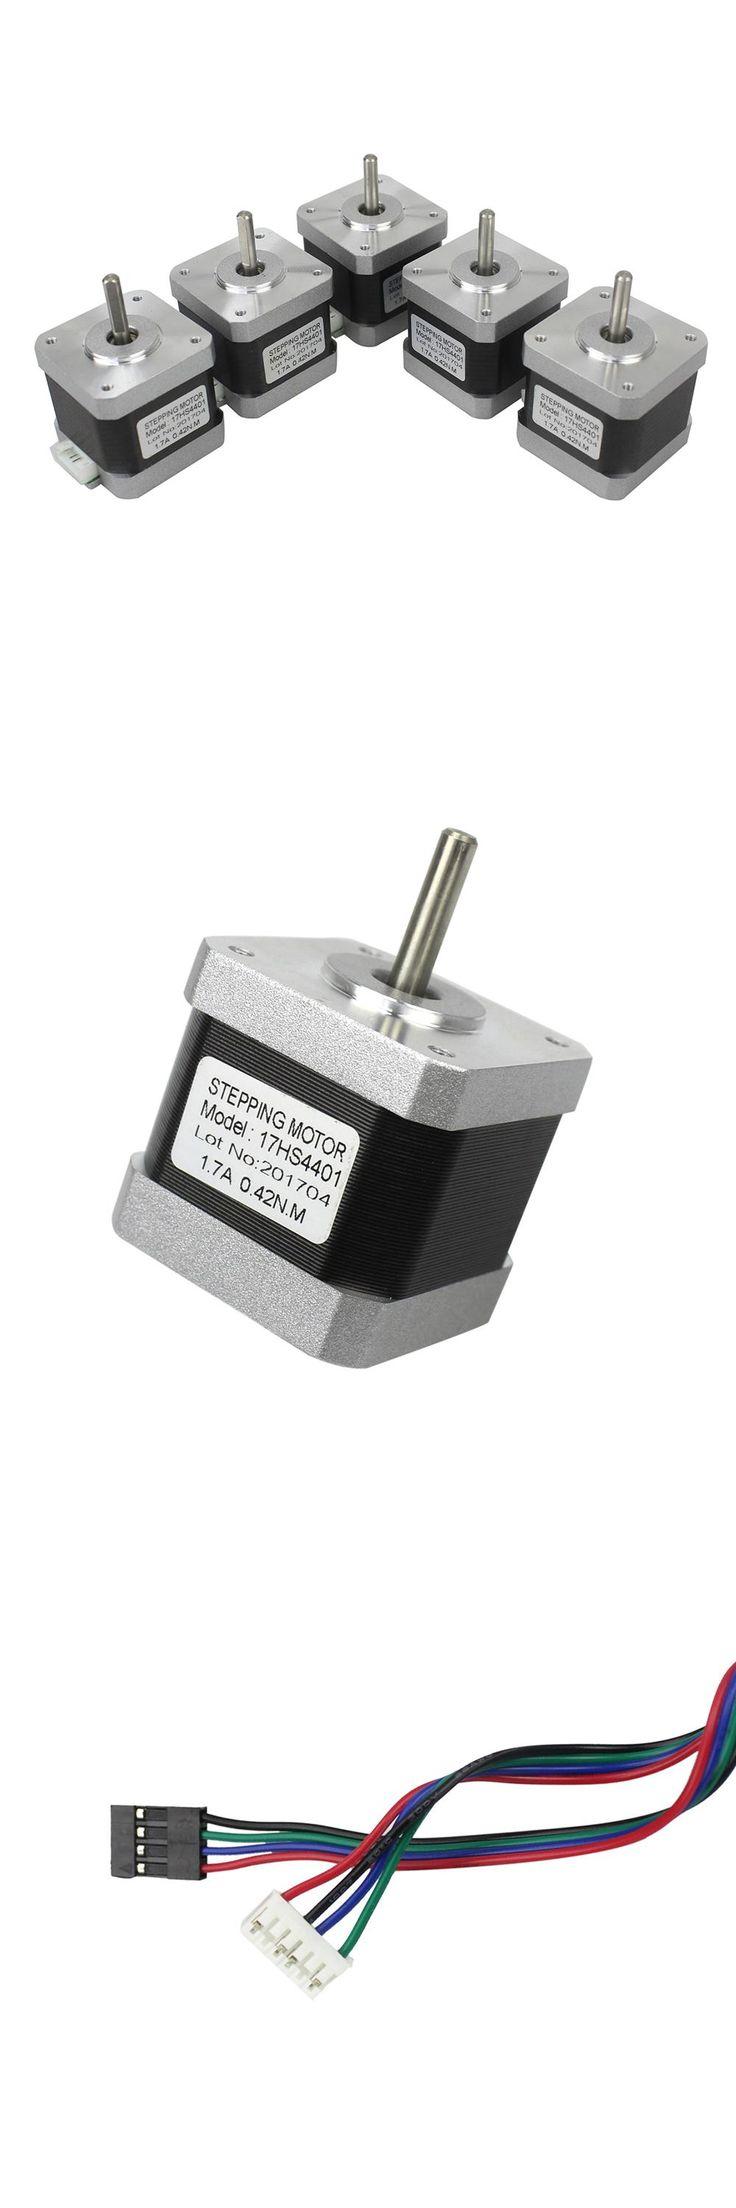 [Visit to Buy] 5PCS For CNC XYZ Nema17 Stepper Motor 42 motor Nema 17 motor 42BYGH 1.7A (17HS4401) motor #Advertisement